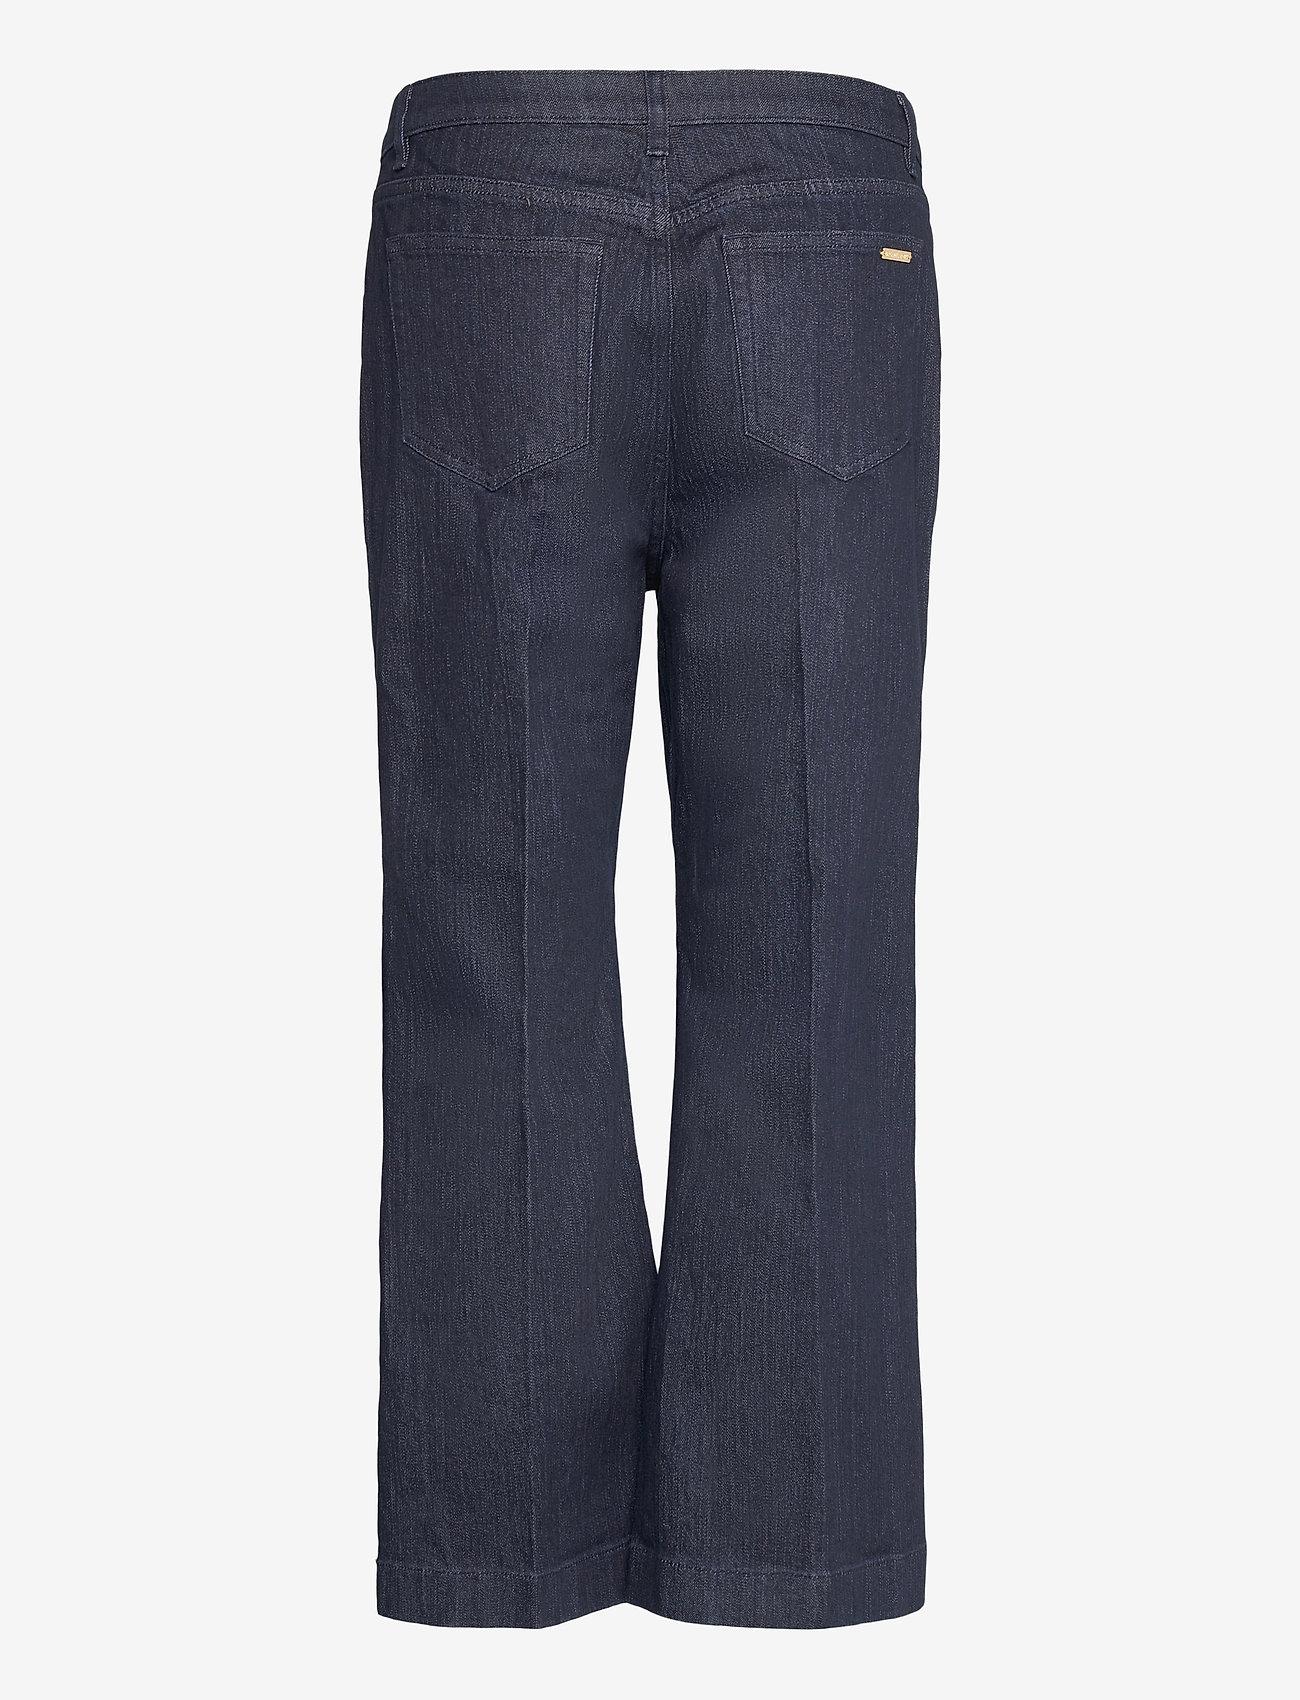 Michael Kors - CROPD KICK SAILOR JEAN - uitlopende jeans - indigo - 1